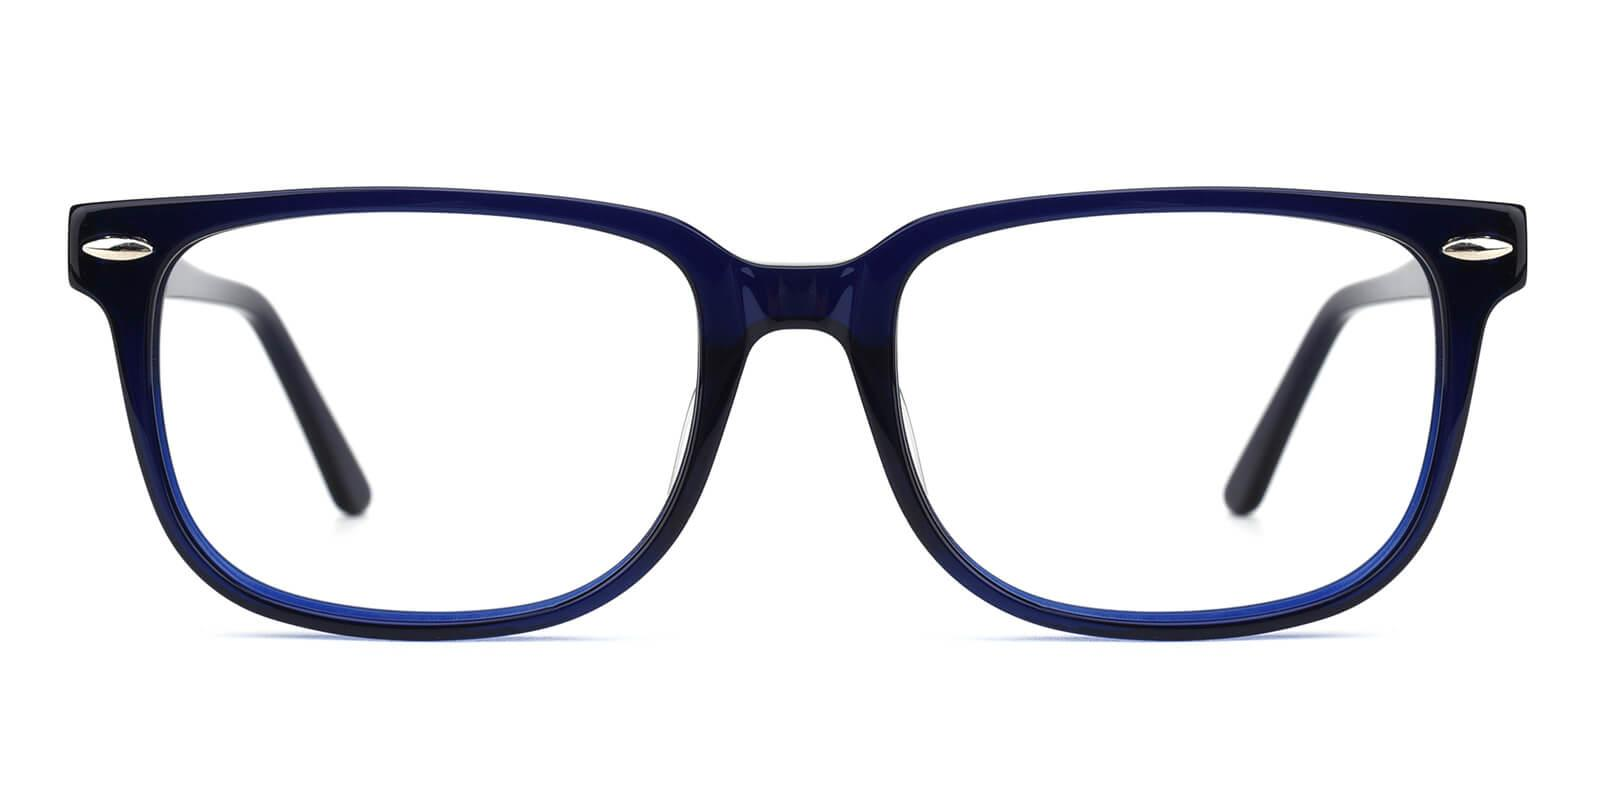 Tempiry-Blue-Rectangle-Acetate-Eyeglasses-additional2